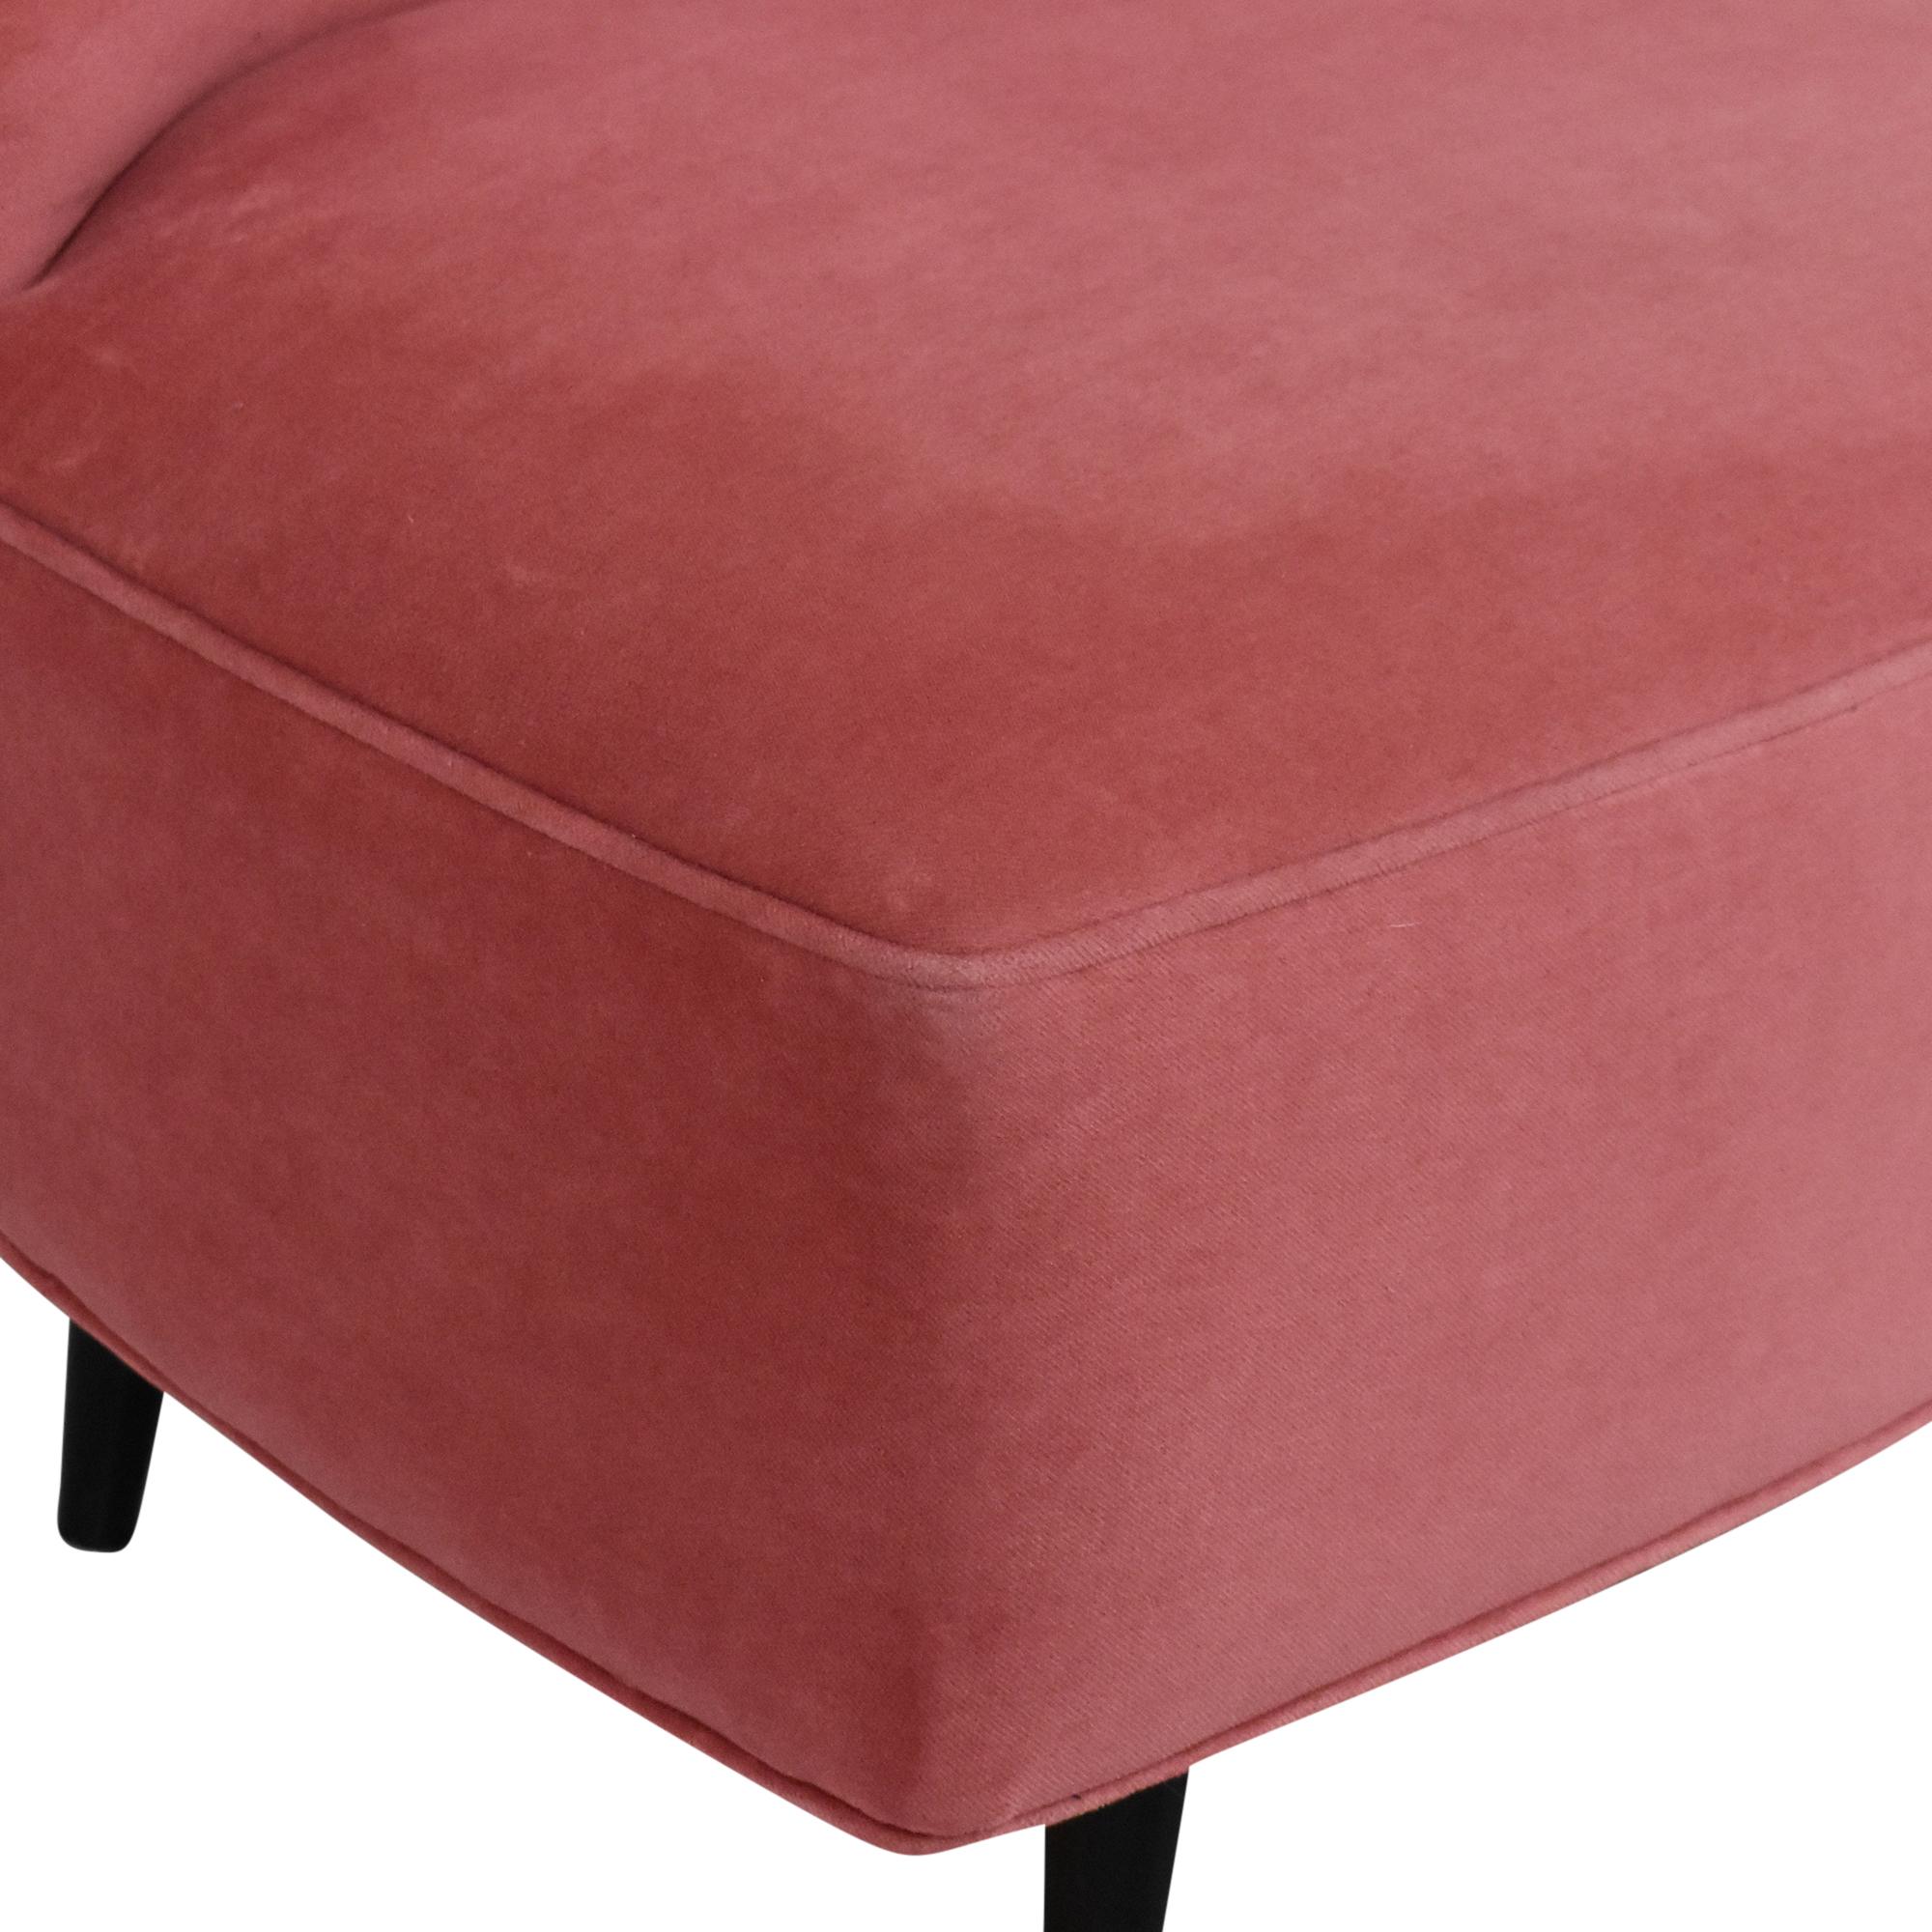 Room & Board Room & Board Swivel Chair pink